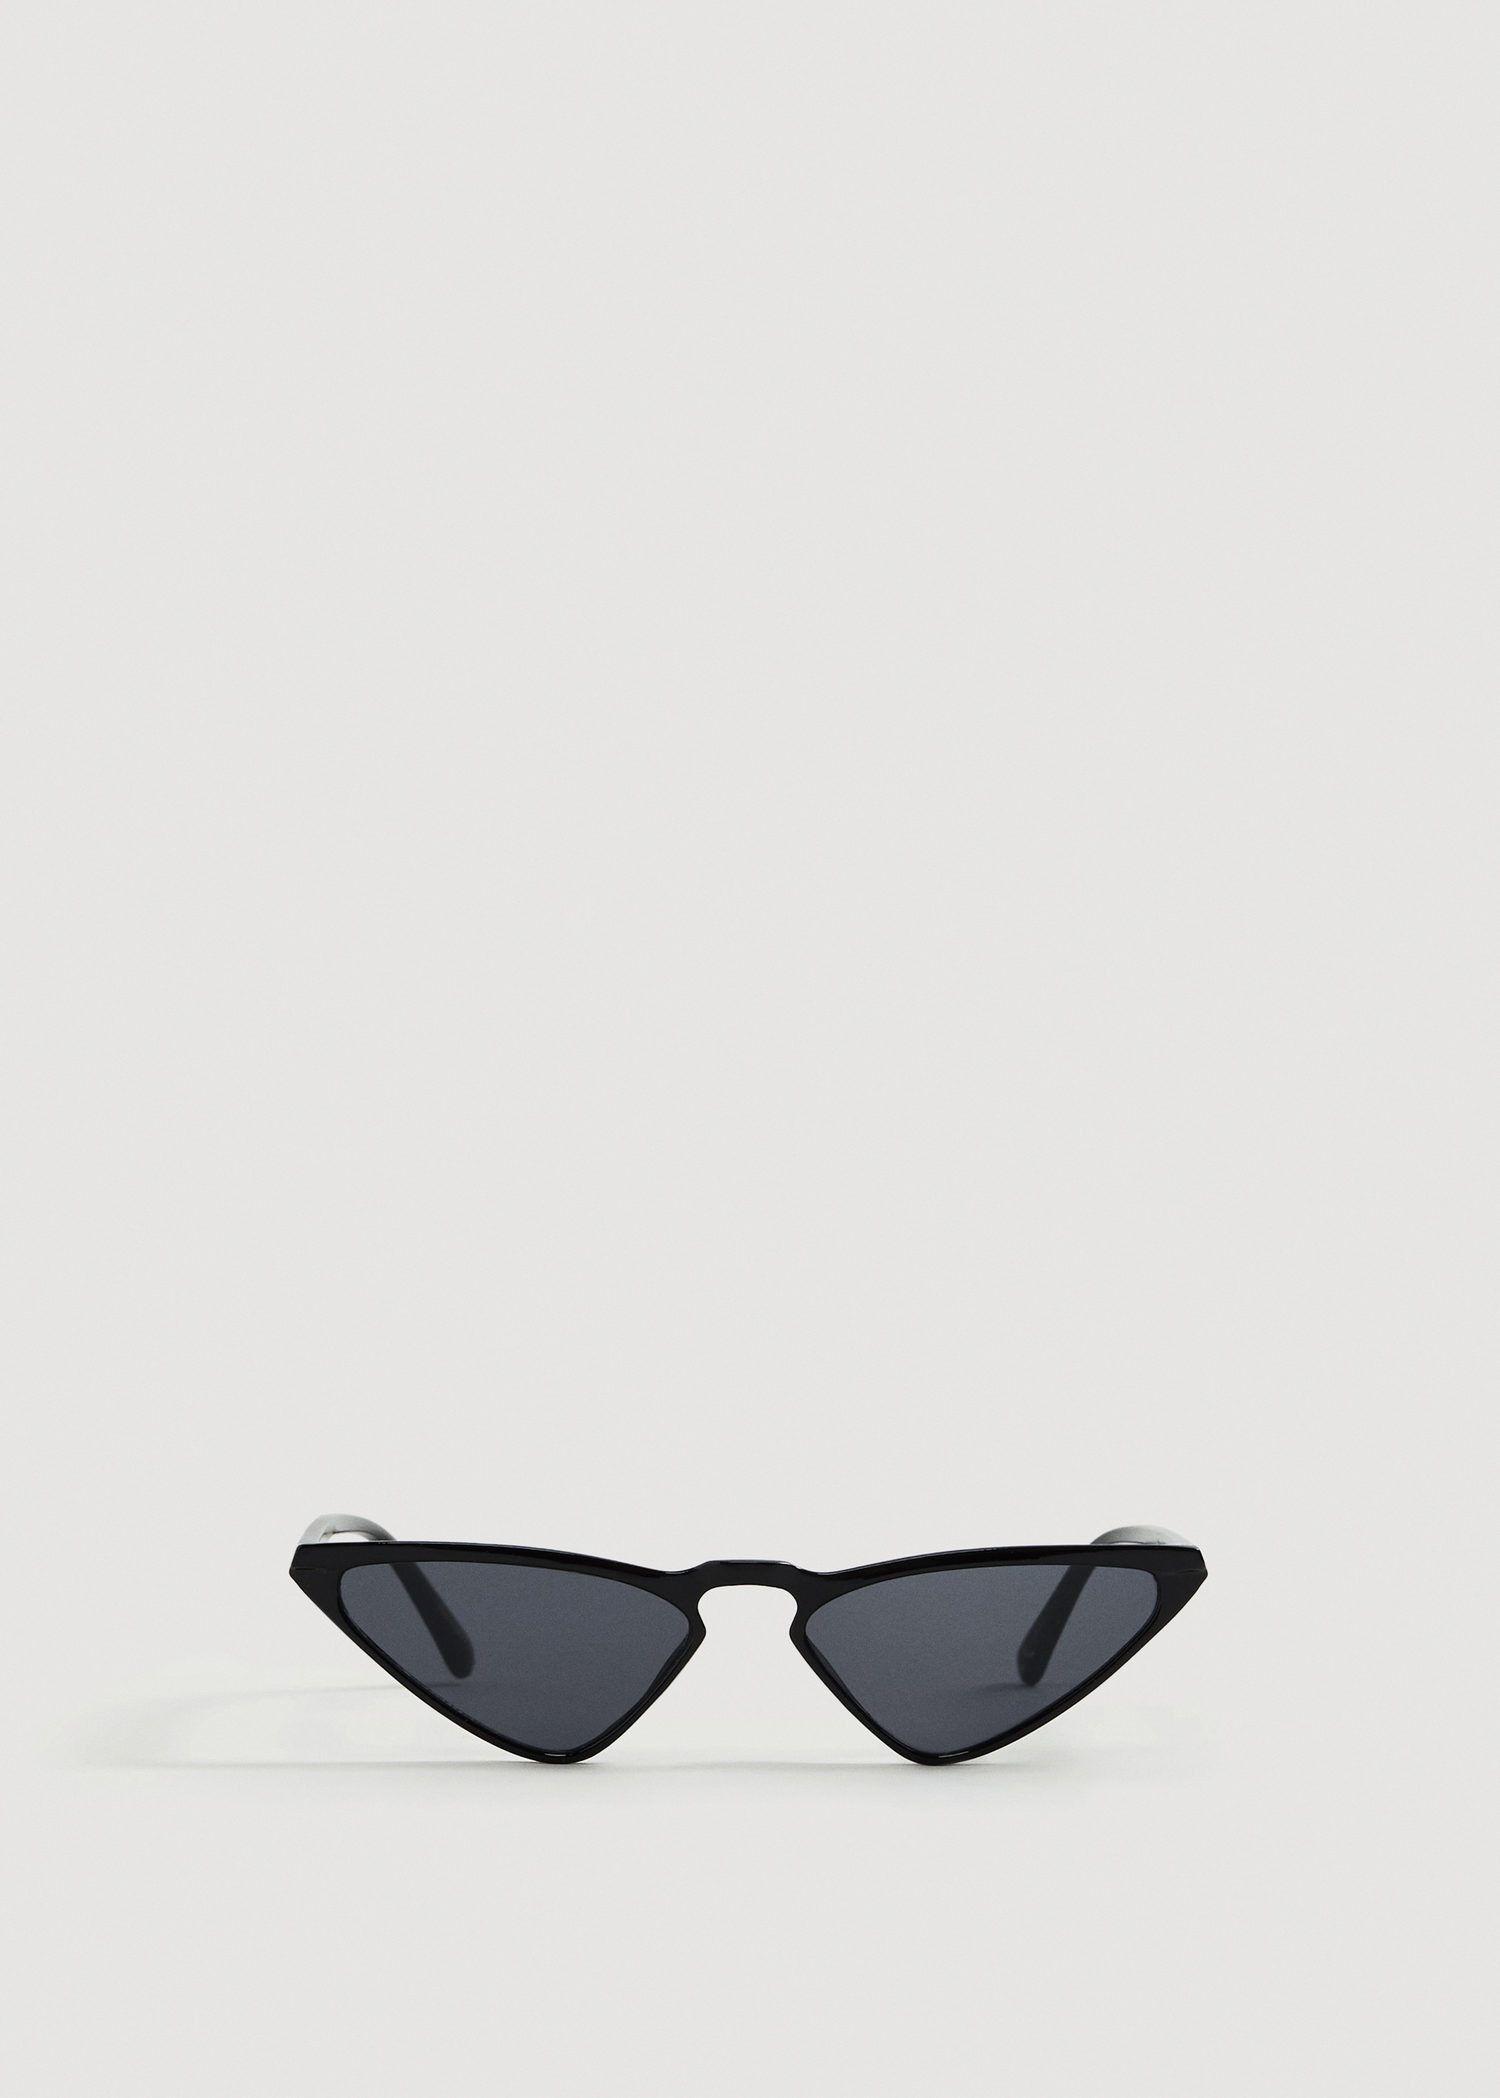 And Gafas Sol De Retro MujerShoes Accesories qMVUSzp